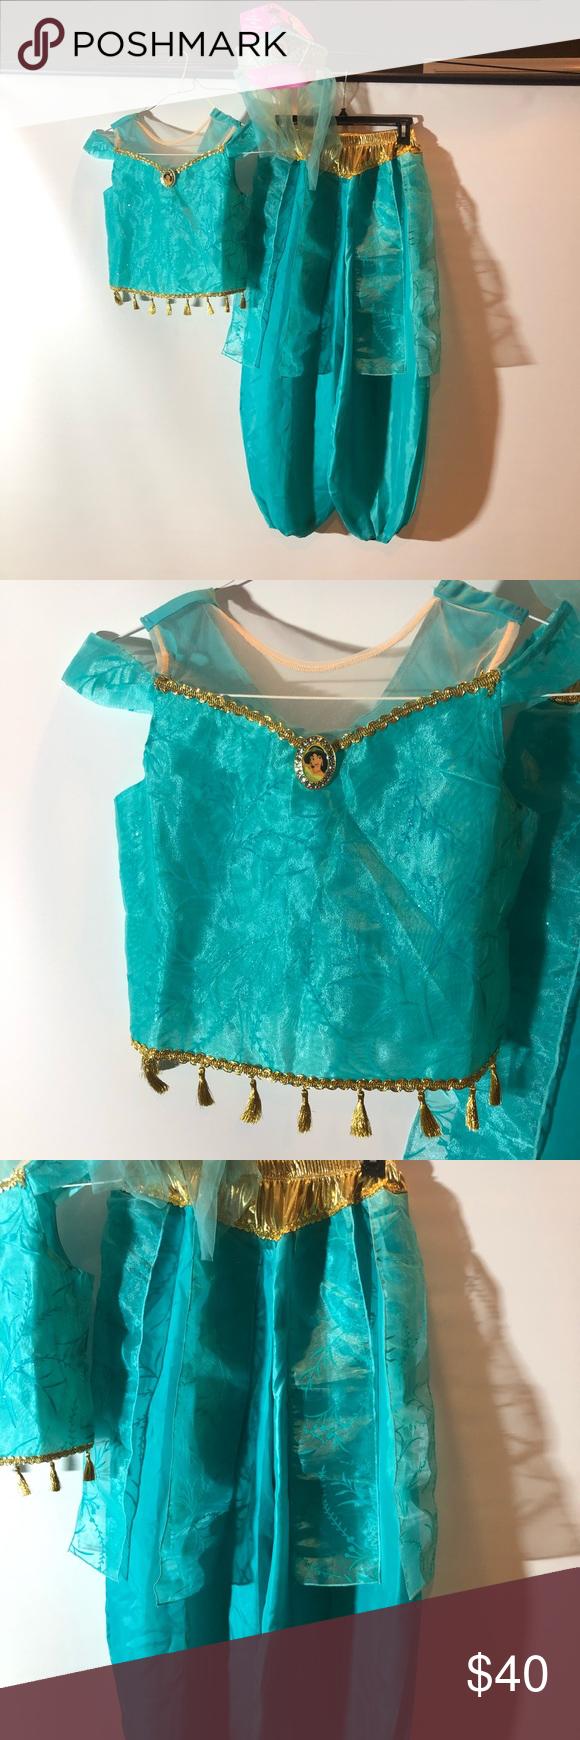 NWT Disney Store Princess Jasmine Costume NWT Princess